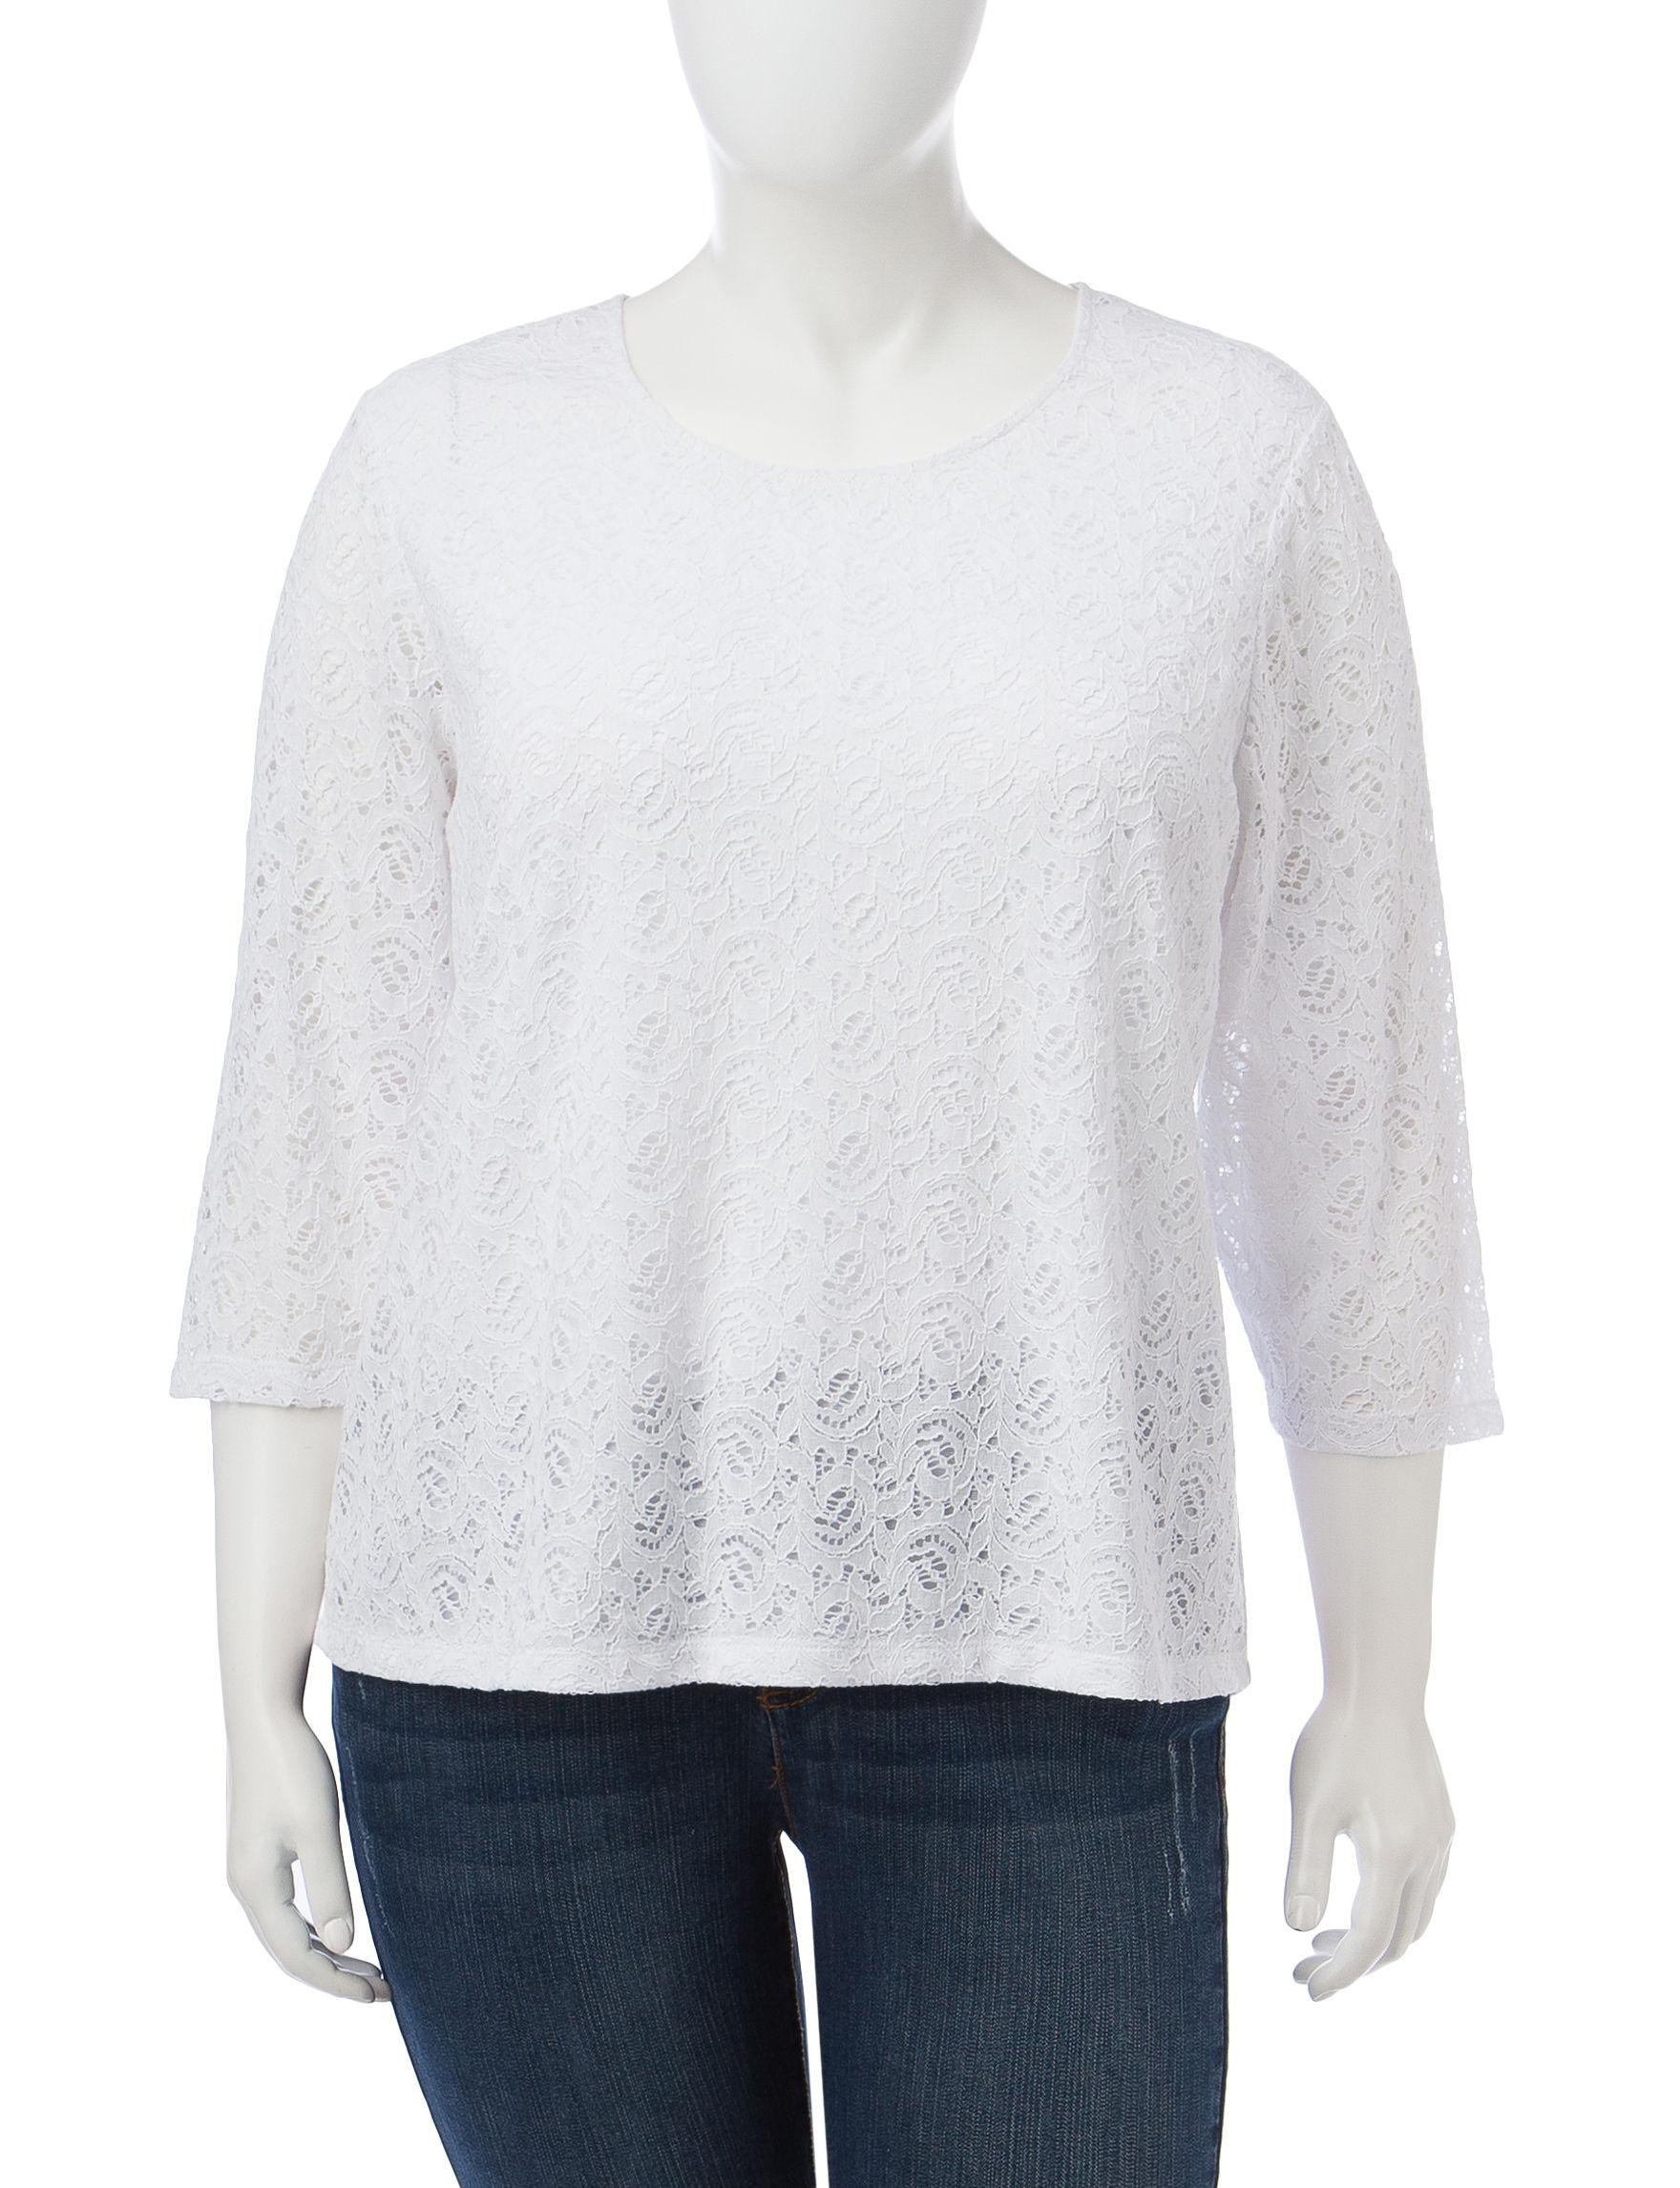 Cathy Daniels White Shirts & Blouses